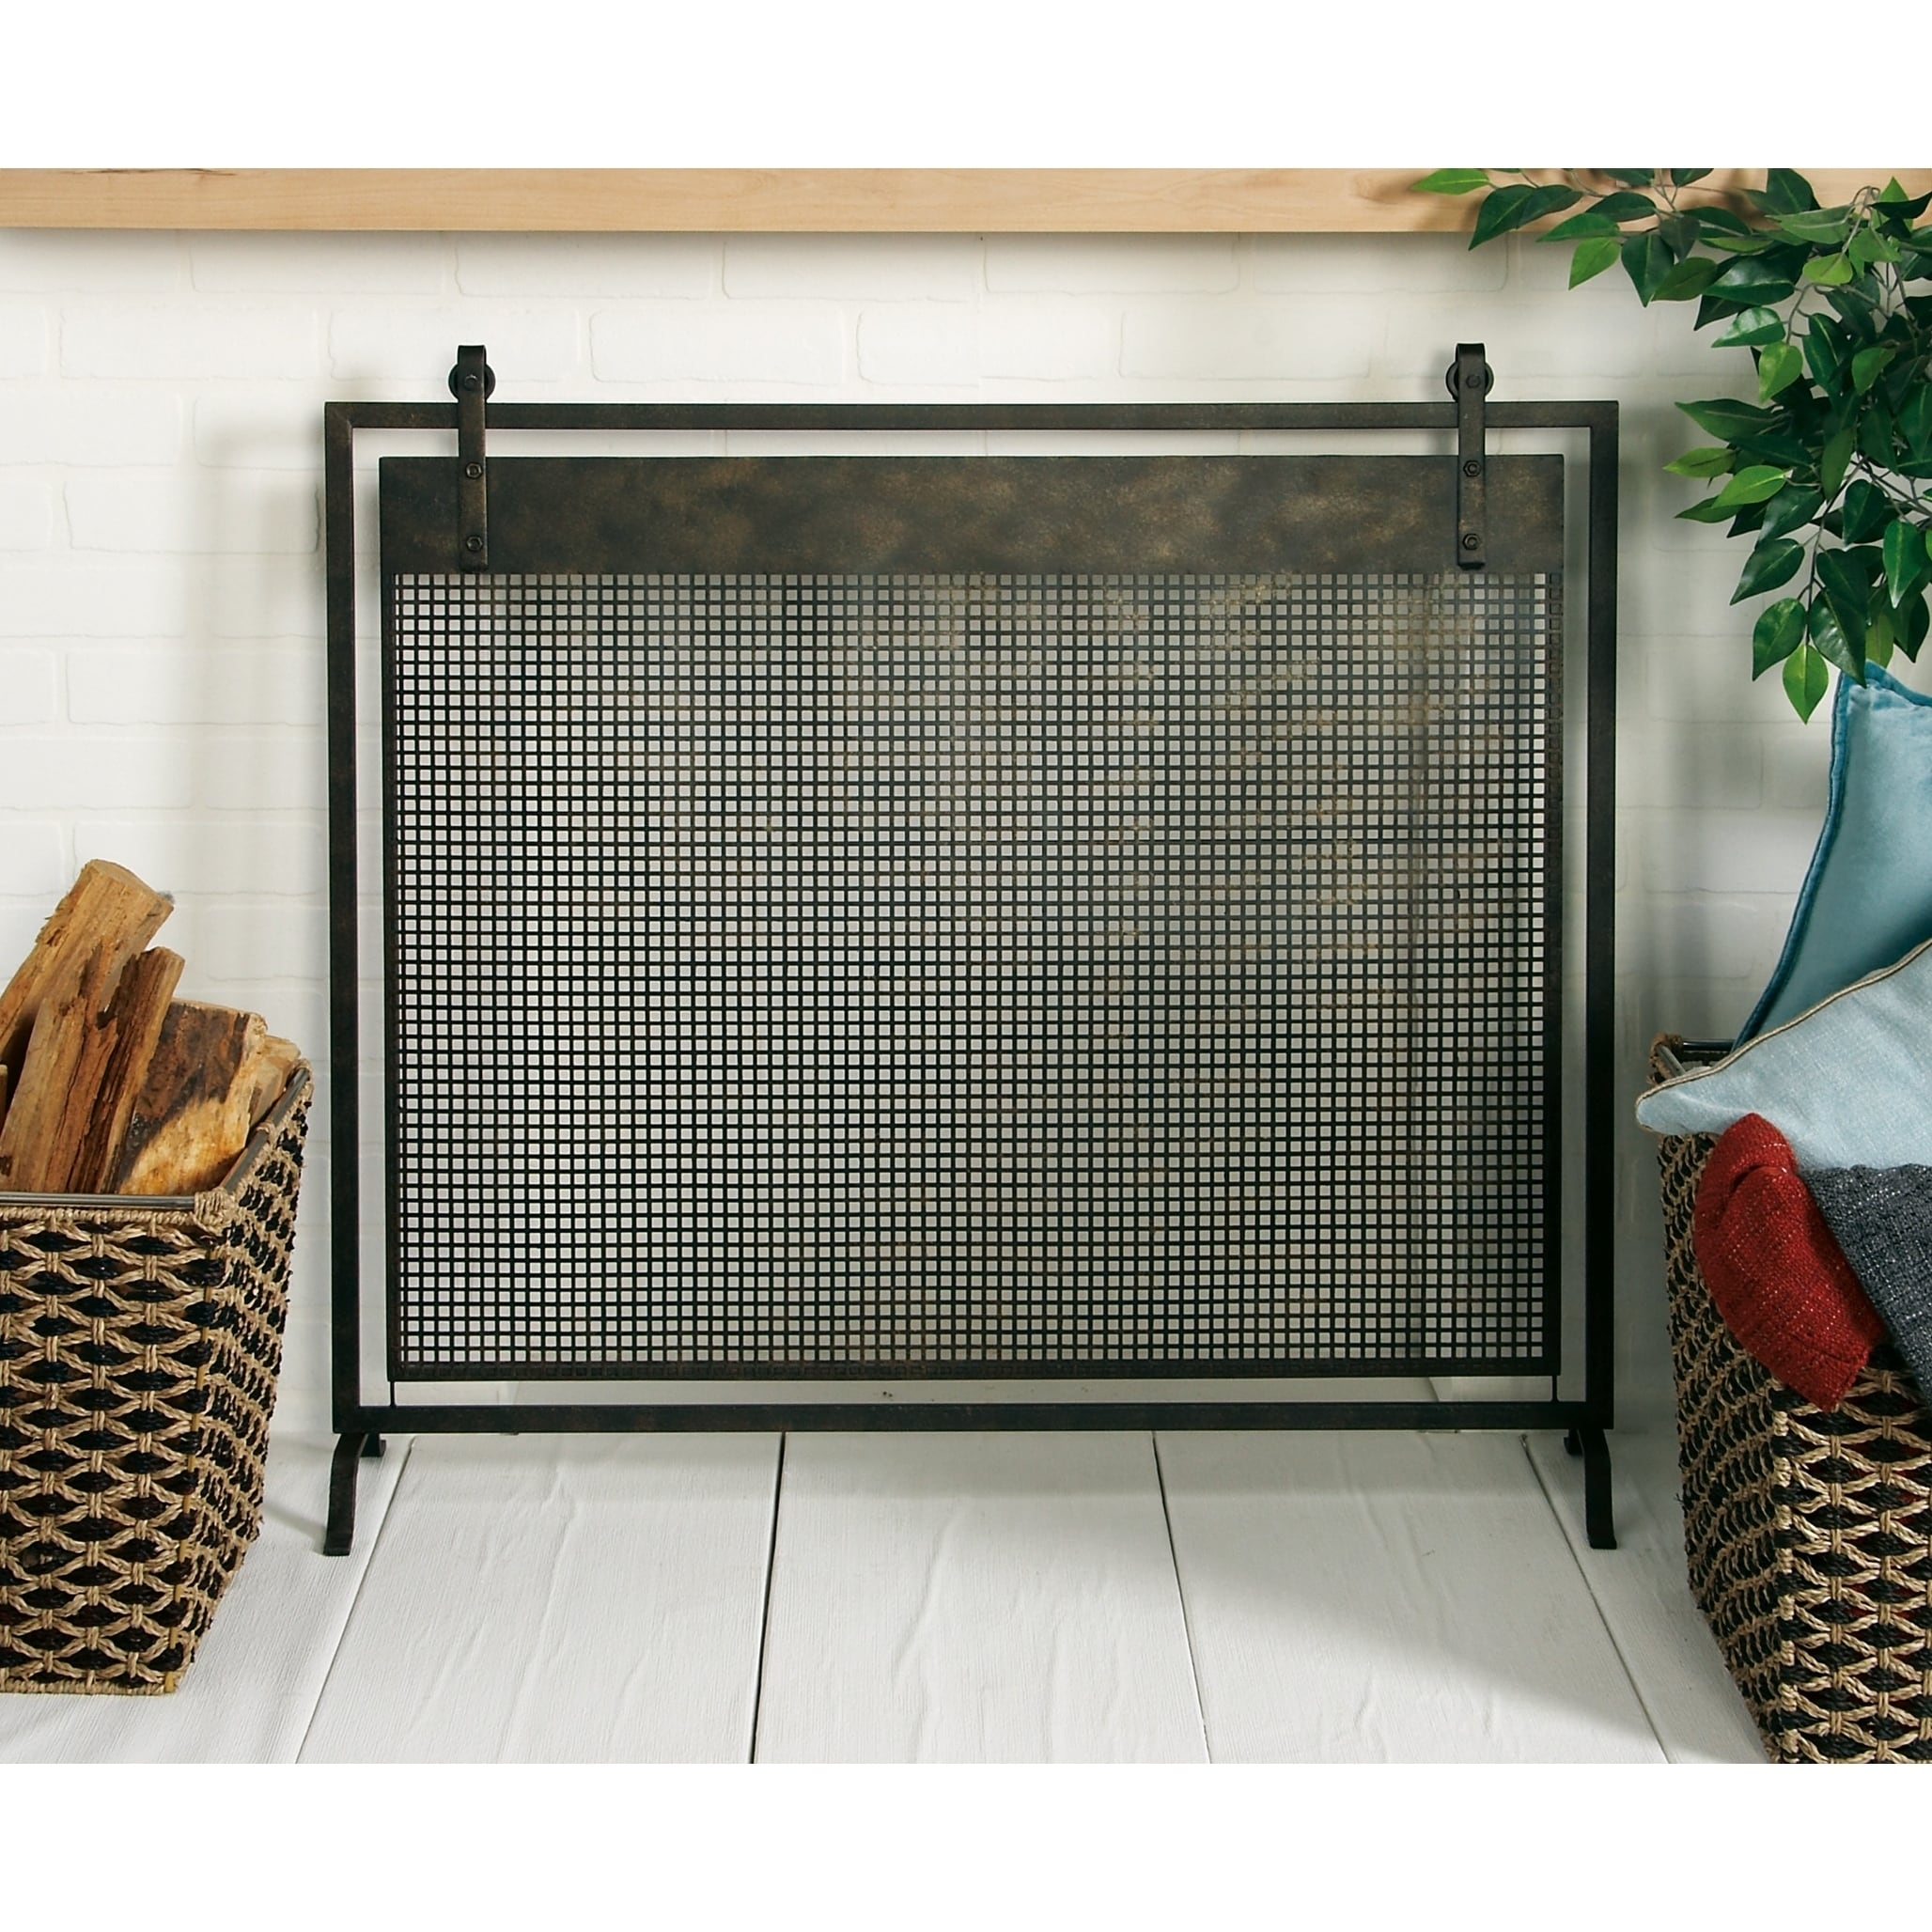 Shop Contemporary 35 X 38 Inch Iron Mesh Fireplace Screen By Studio